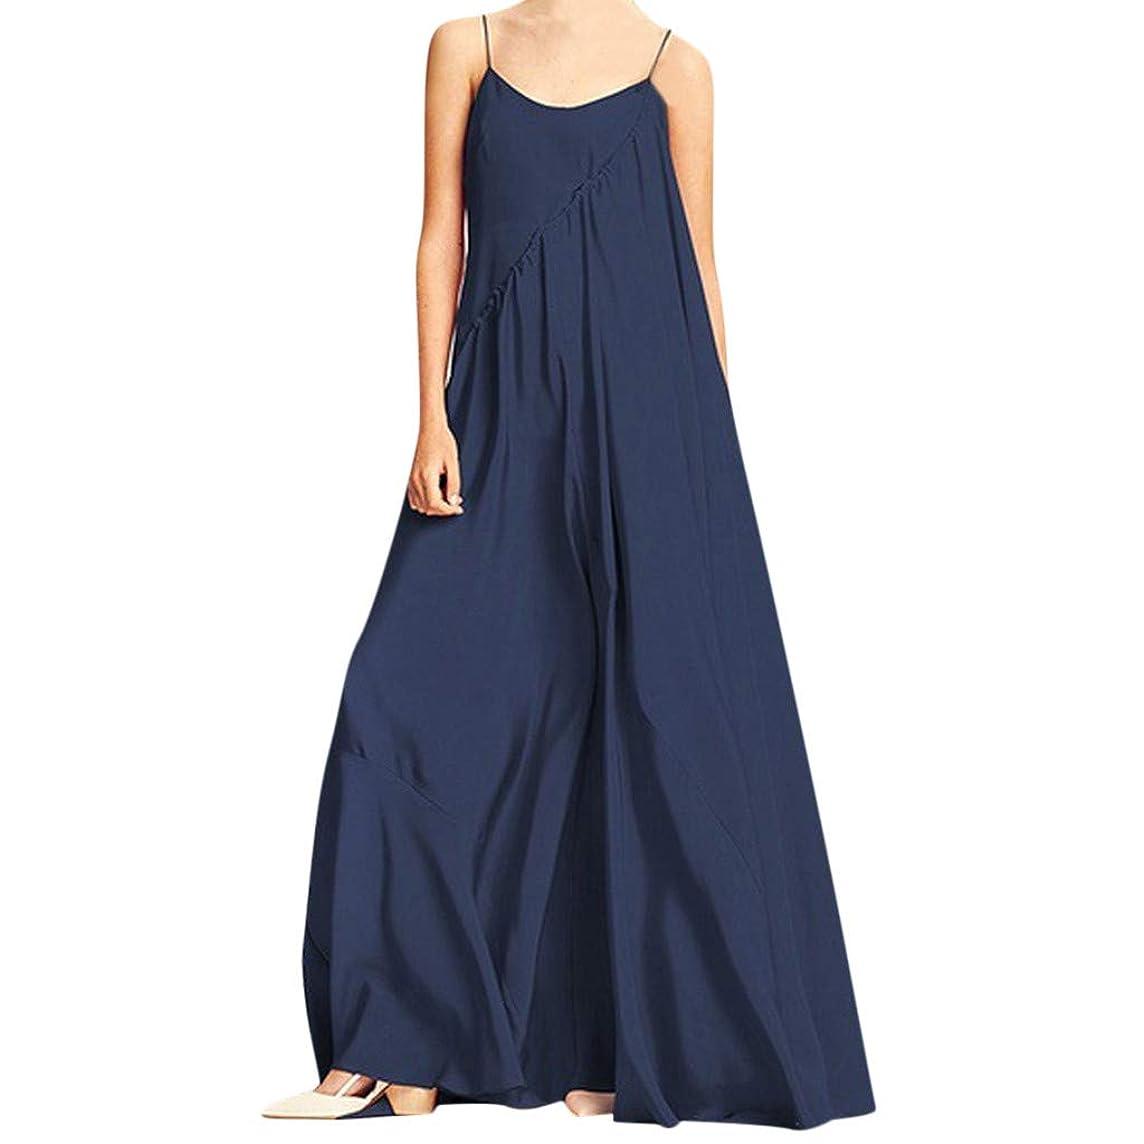 LEERYAAY Women's Dresses Long Maxi Casual Halter Strap Summer Fashion Solid Color